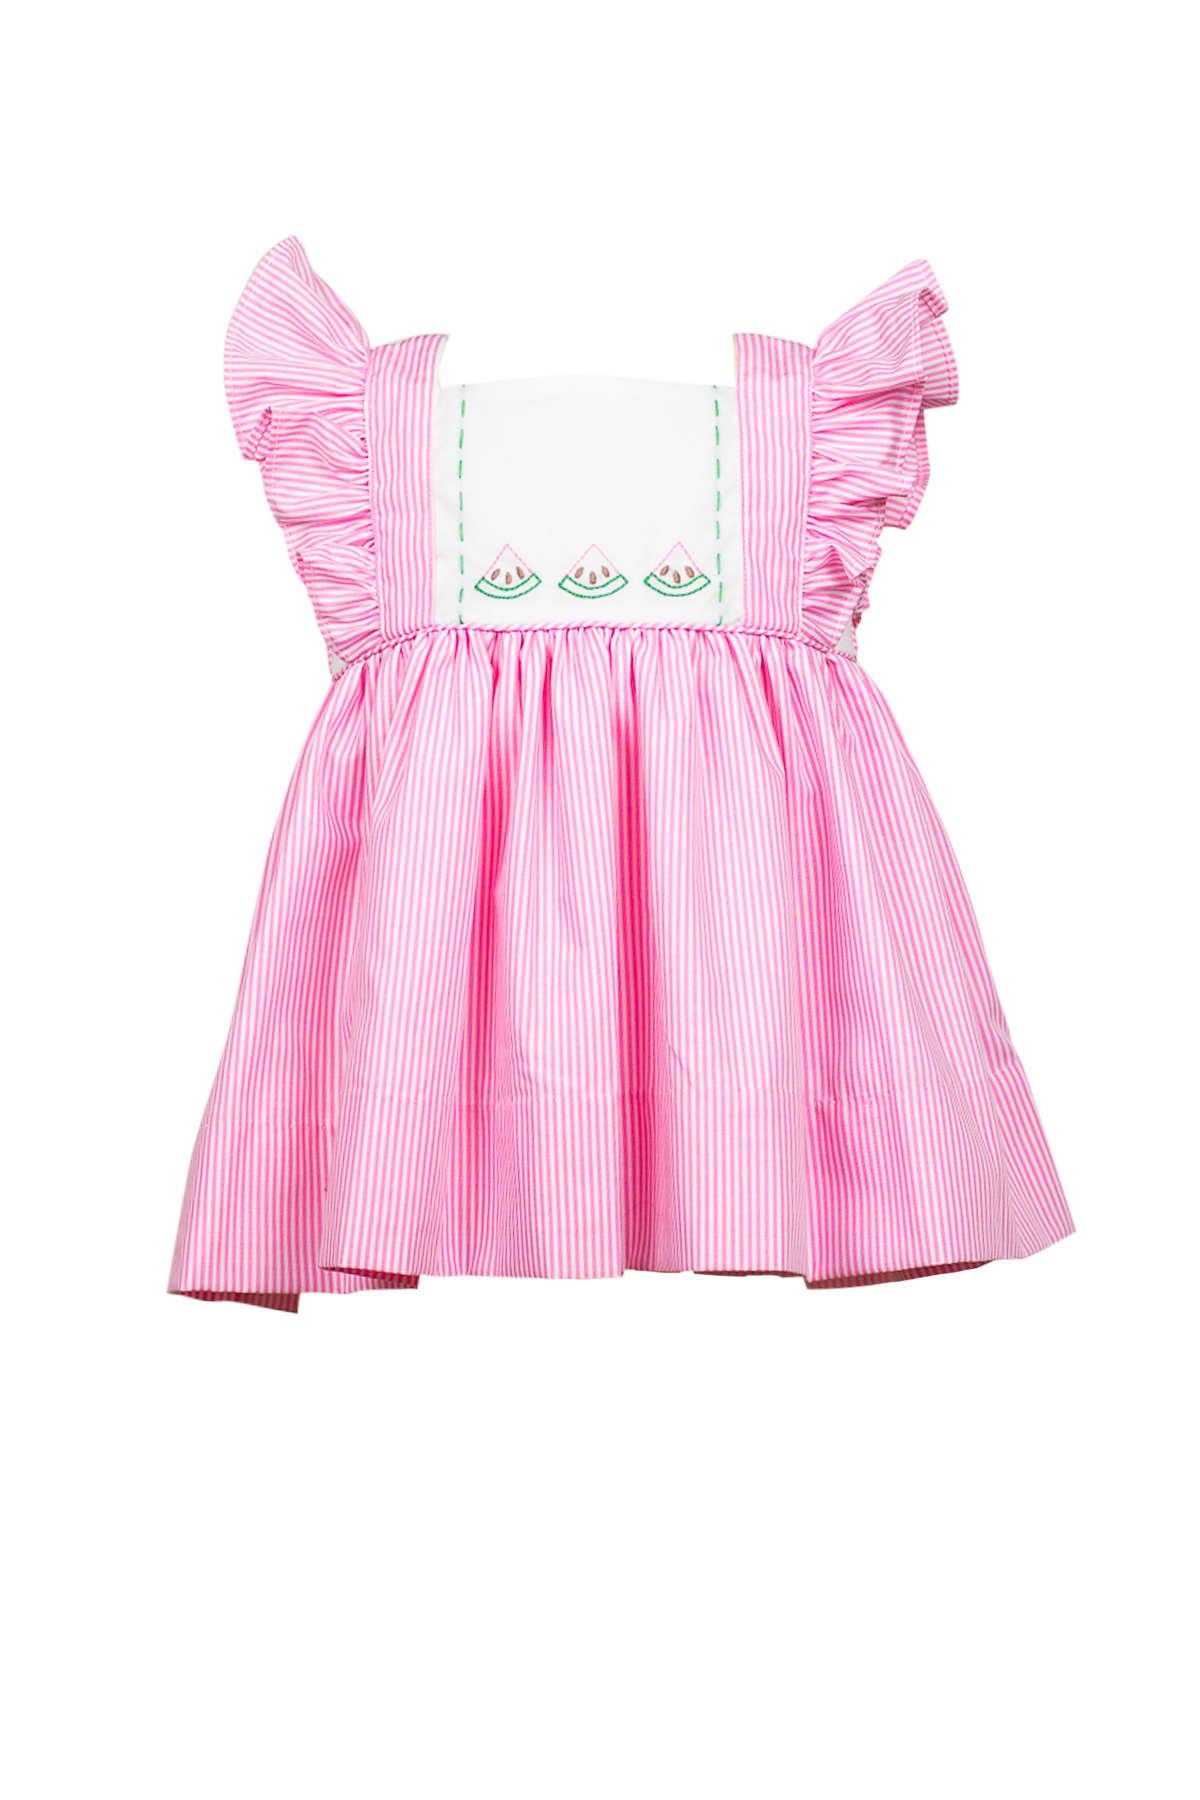 WENDY WATERMELON DRESS